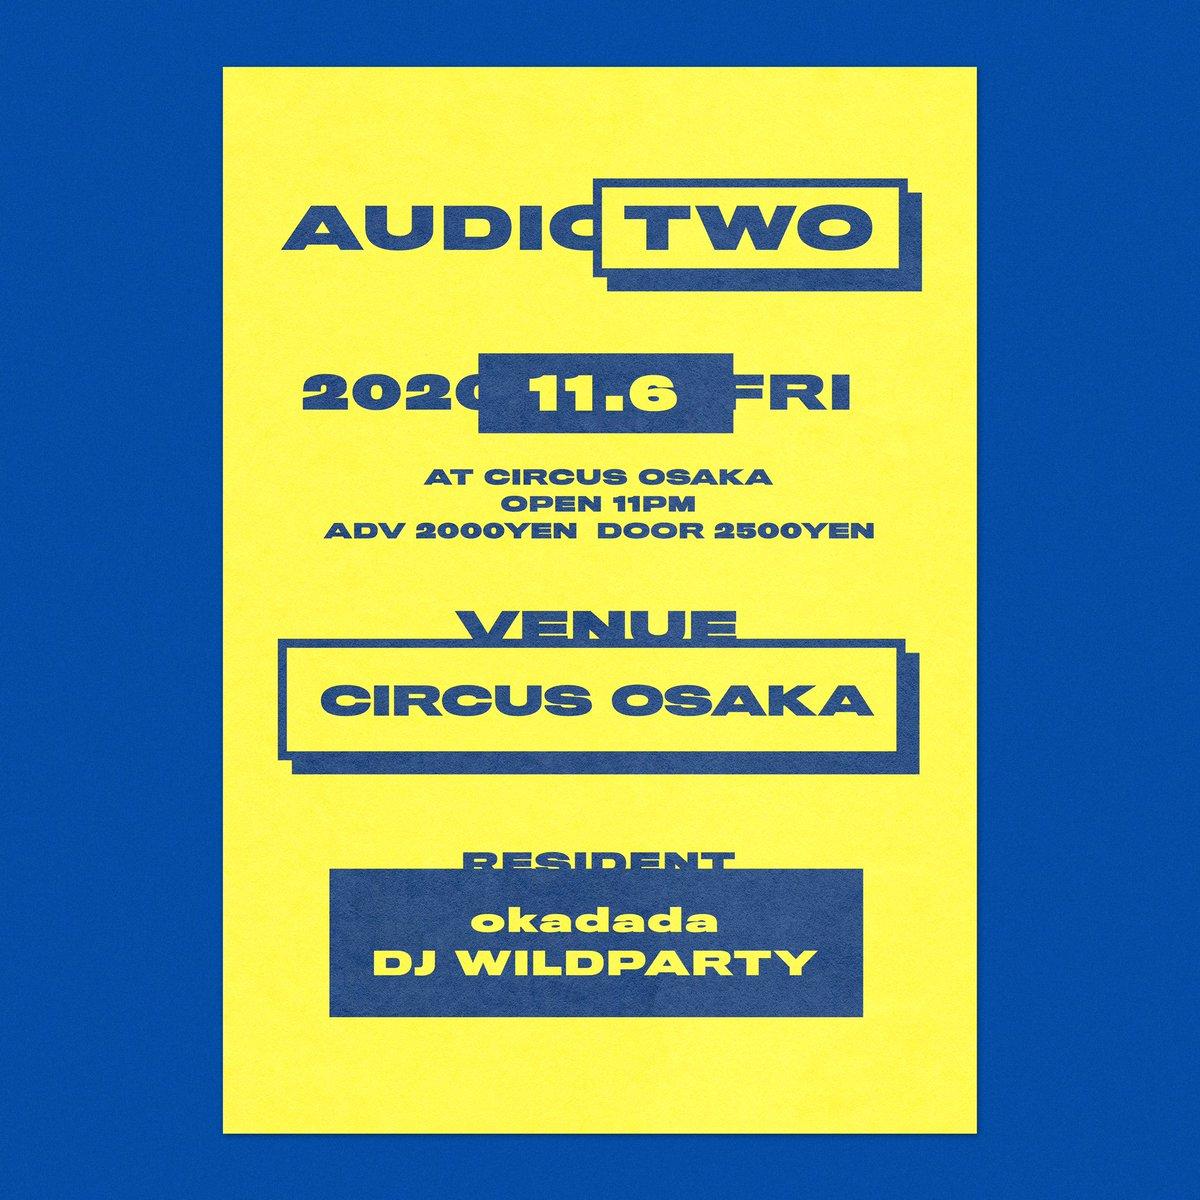 【11/6(金) AUDIO TWO開催決定!】resident:okadada,DJ WILDPARTYopen 23:00-all night@CIRCUSOSAKA 前売取置予約(2000円)➡️